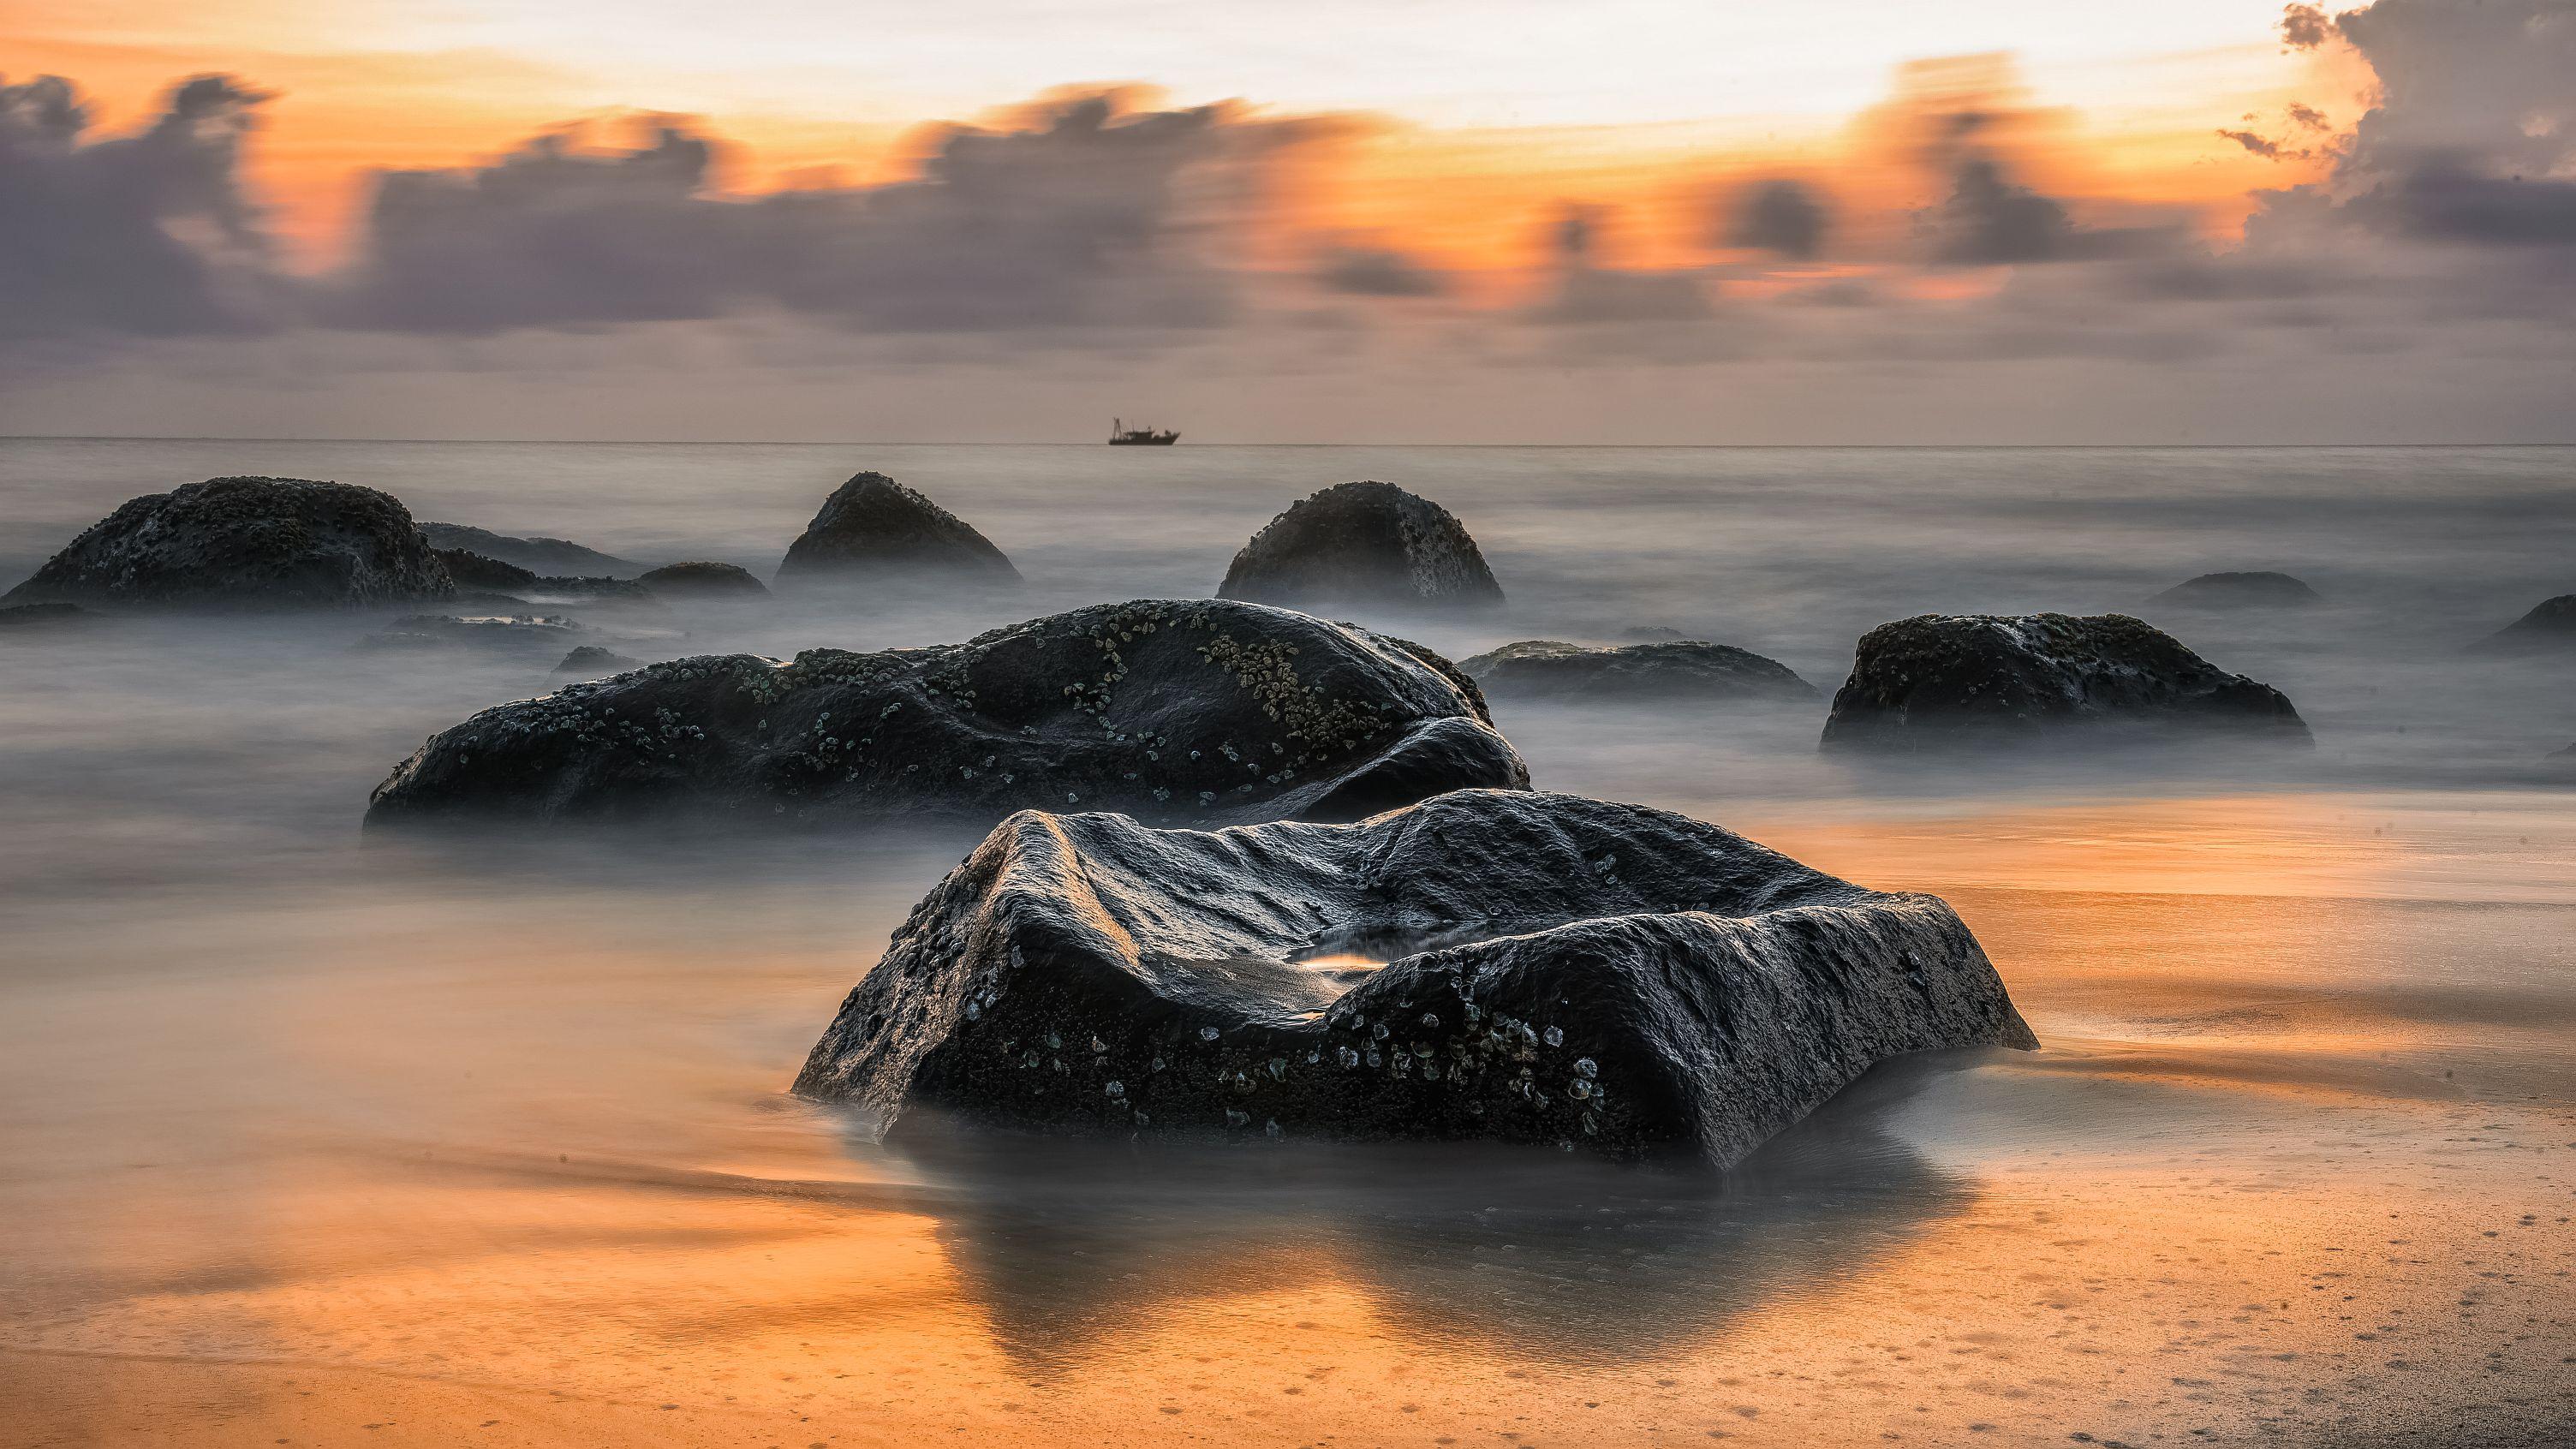 Dawn beauty of Kovalam